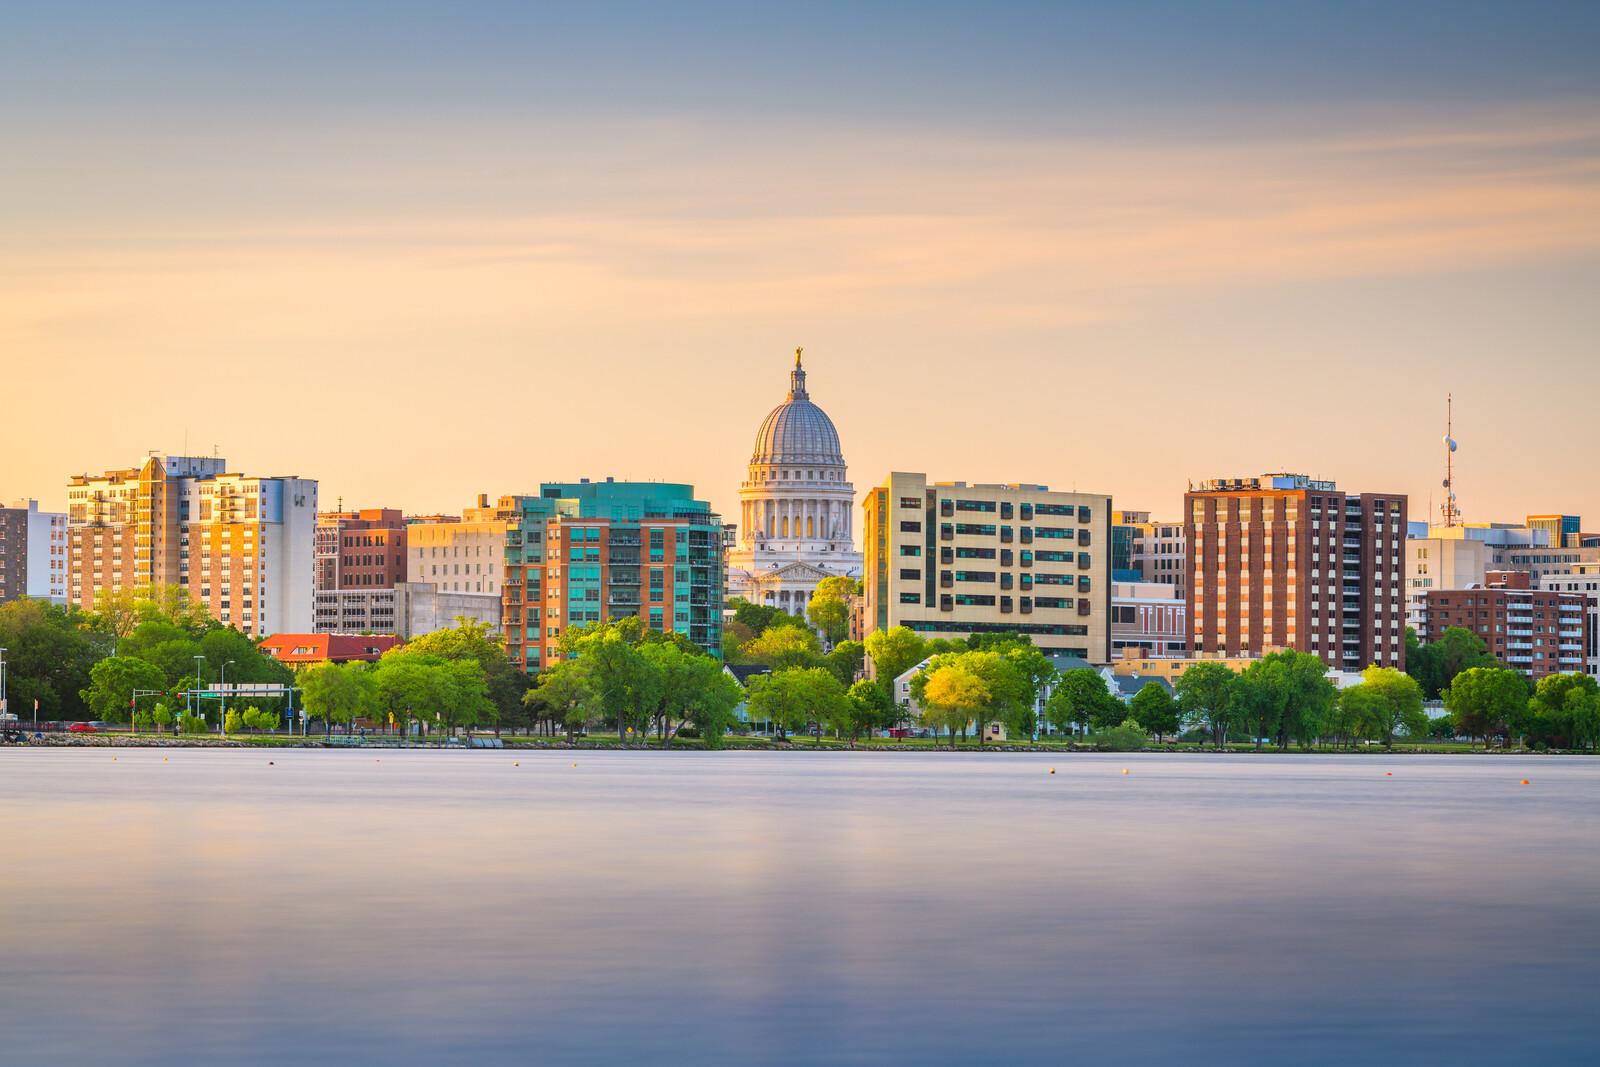 Madison, wisconsin, the downtown skyline at sunset on lake monona.